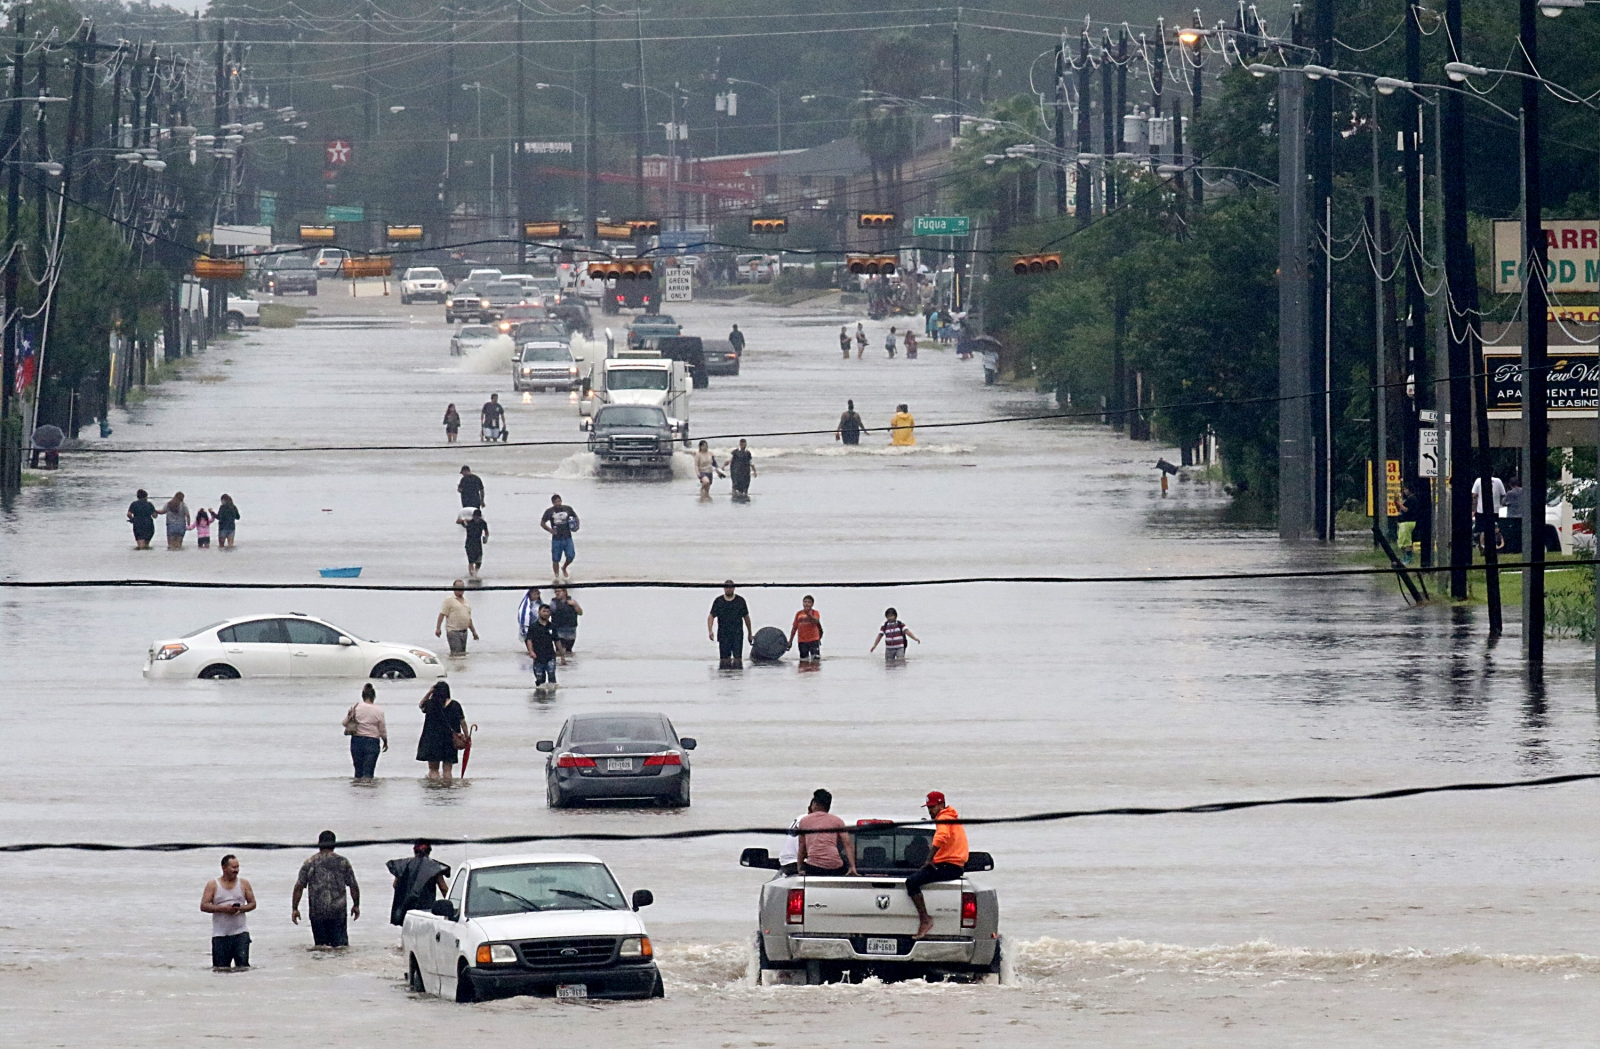 Storm Harvey: Texas Lashed With 'Unprecedented' Rain